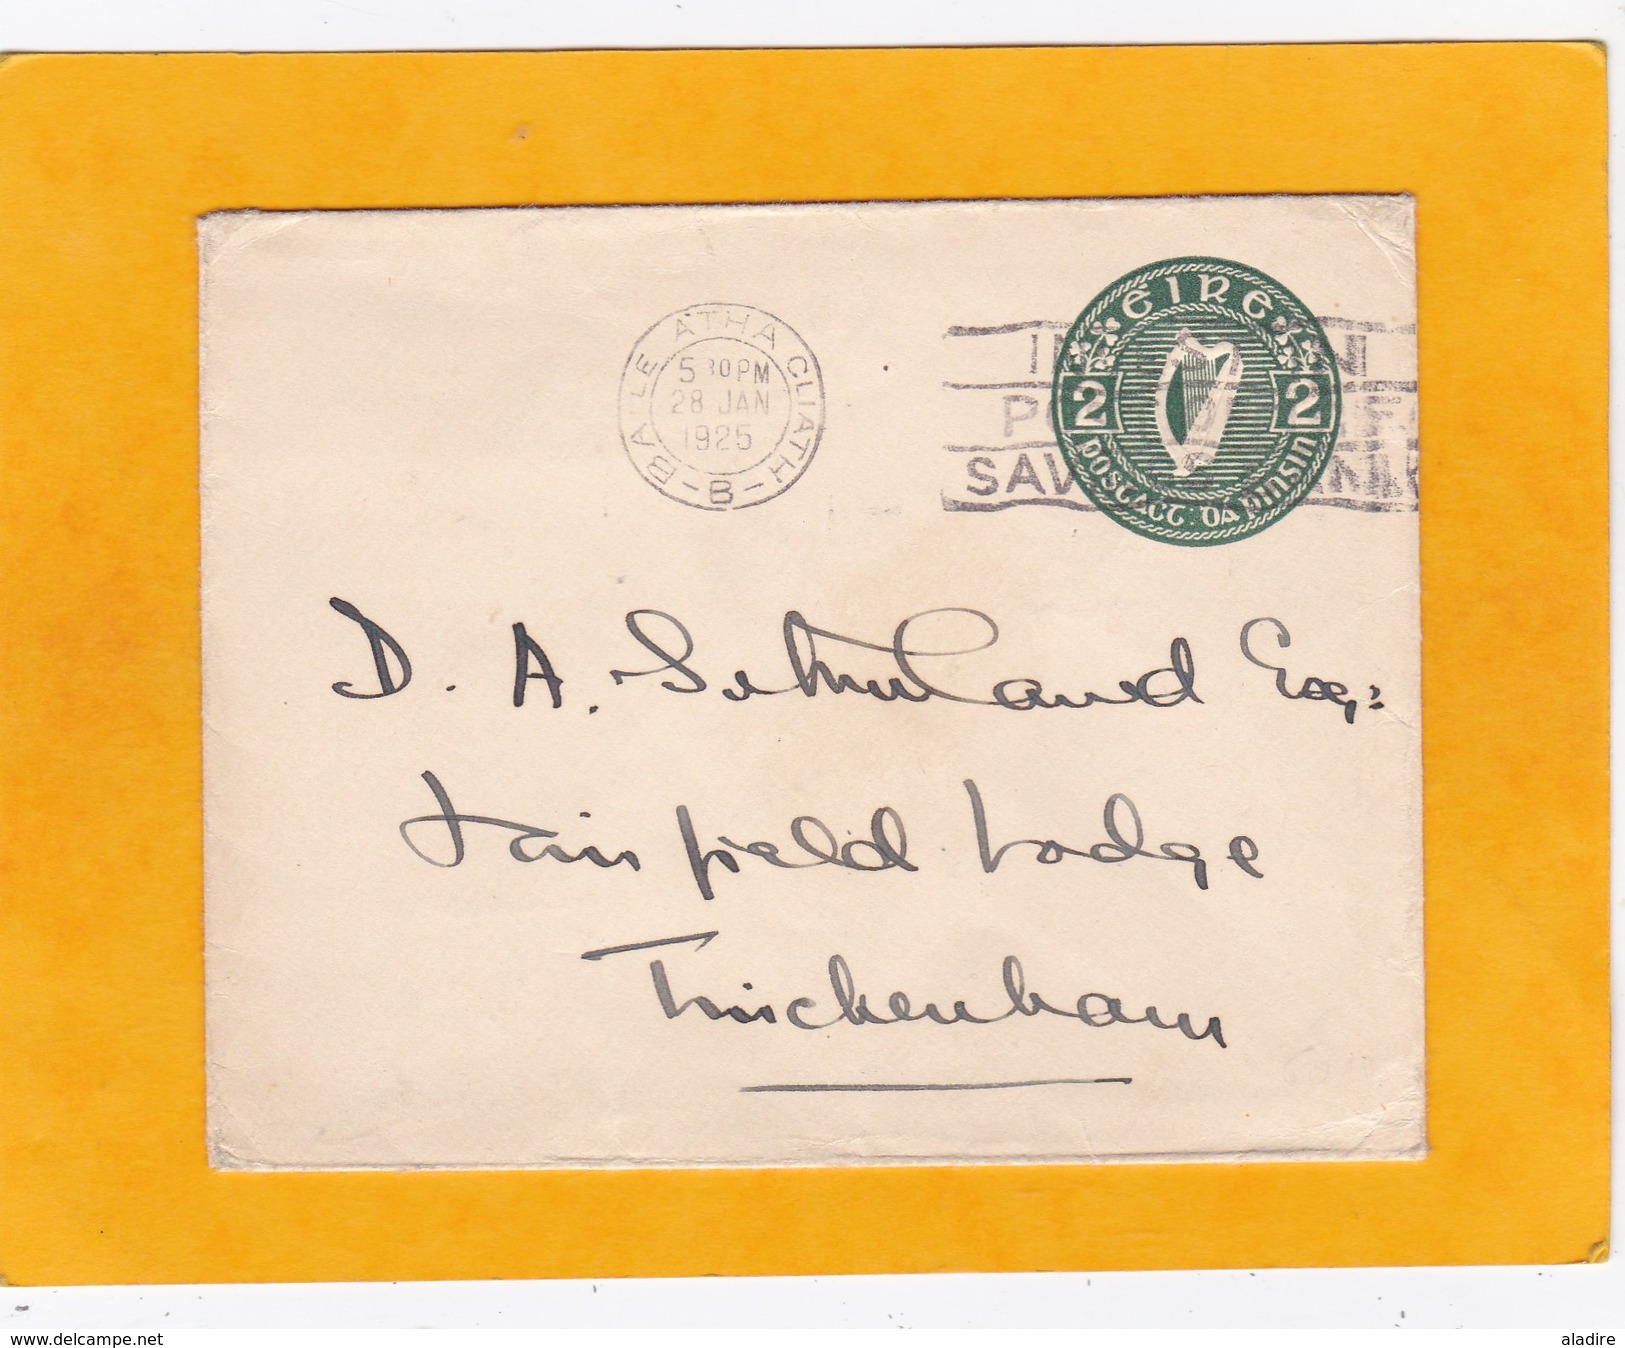 1925 - Enveloppe Entier Postal 2 D  Lyre Vert De Baile Atha Cliath  (Dublin) Vers Twickenham, Angleterre - Briefe U. Dokumente